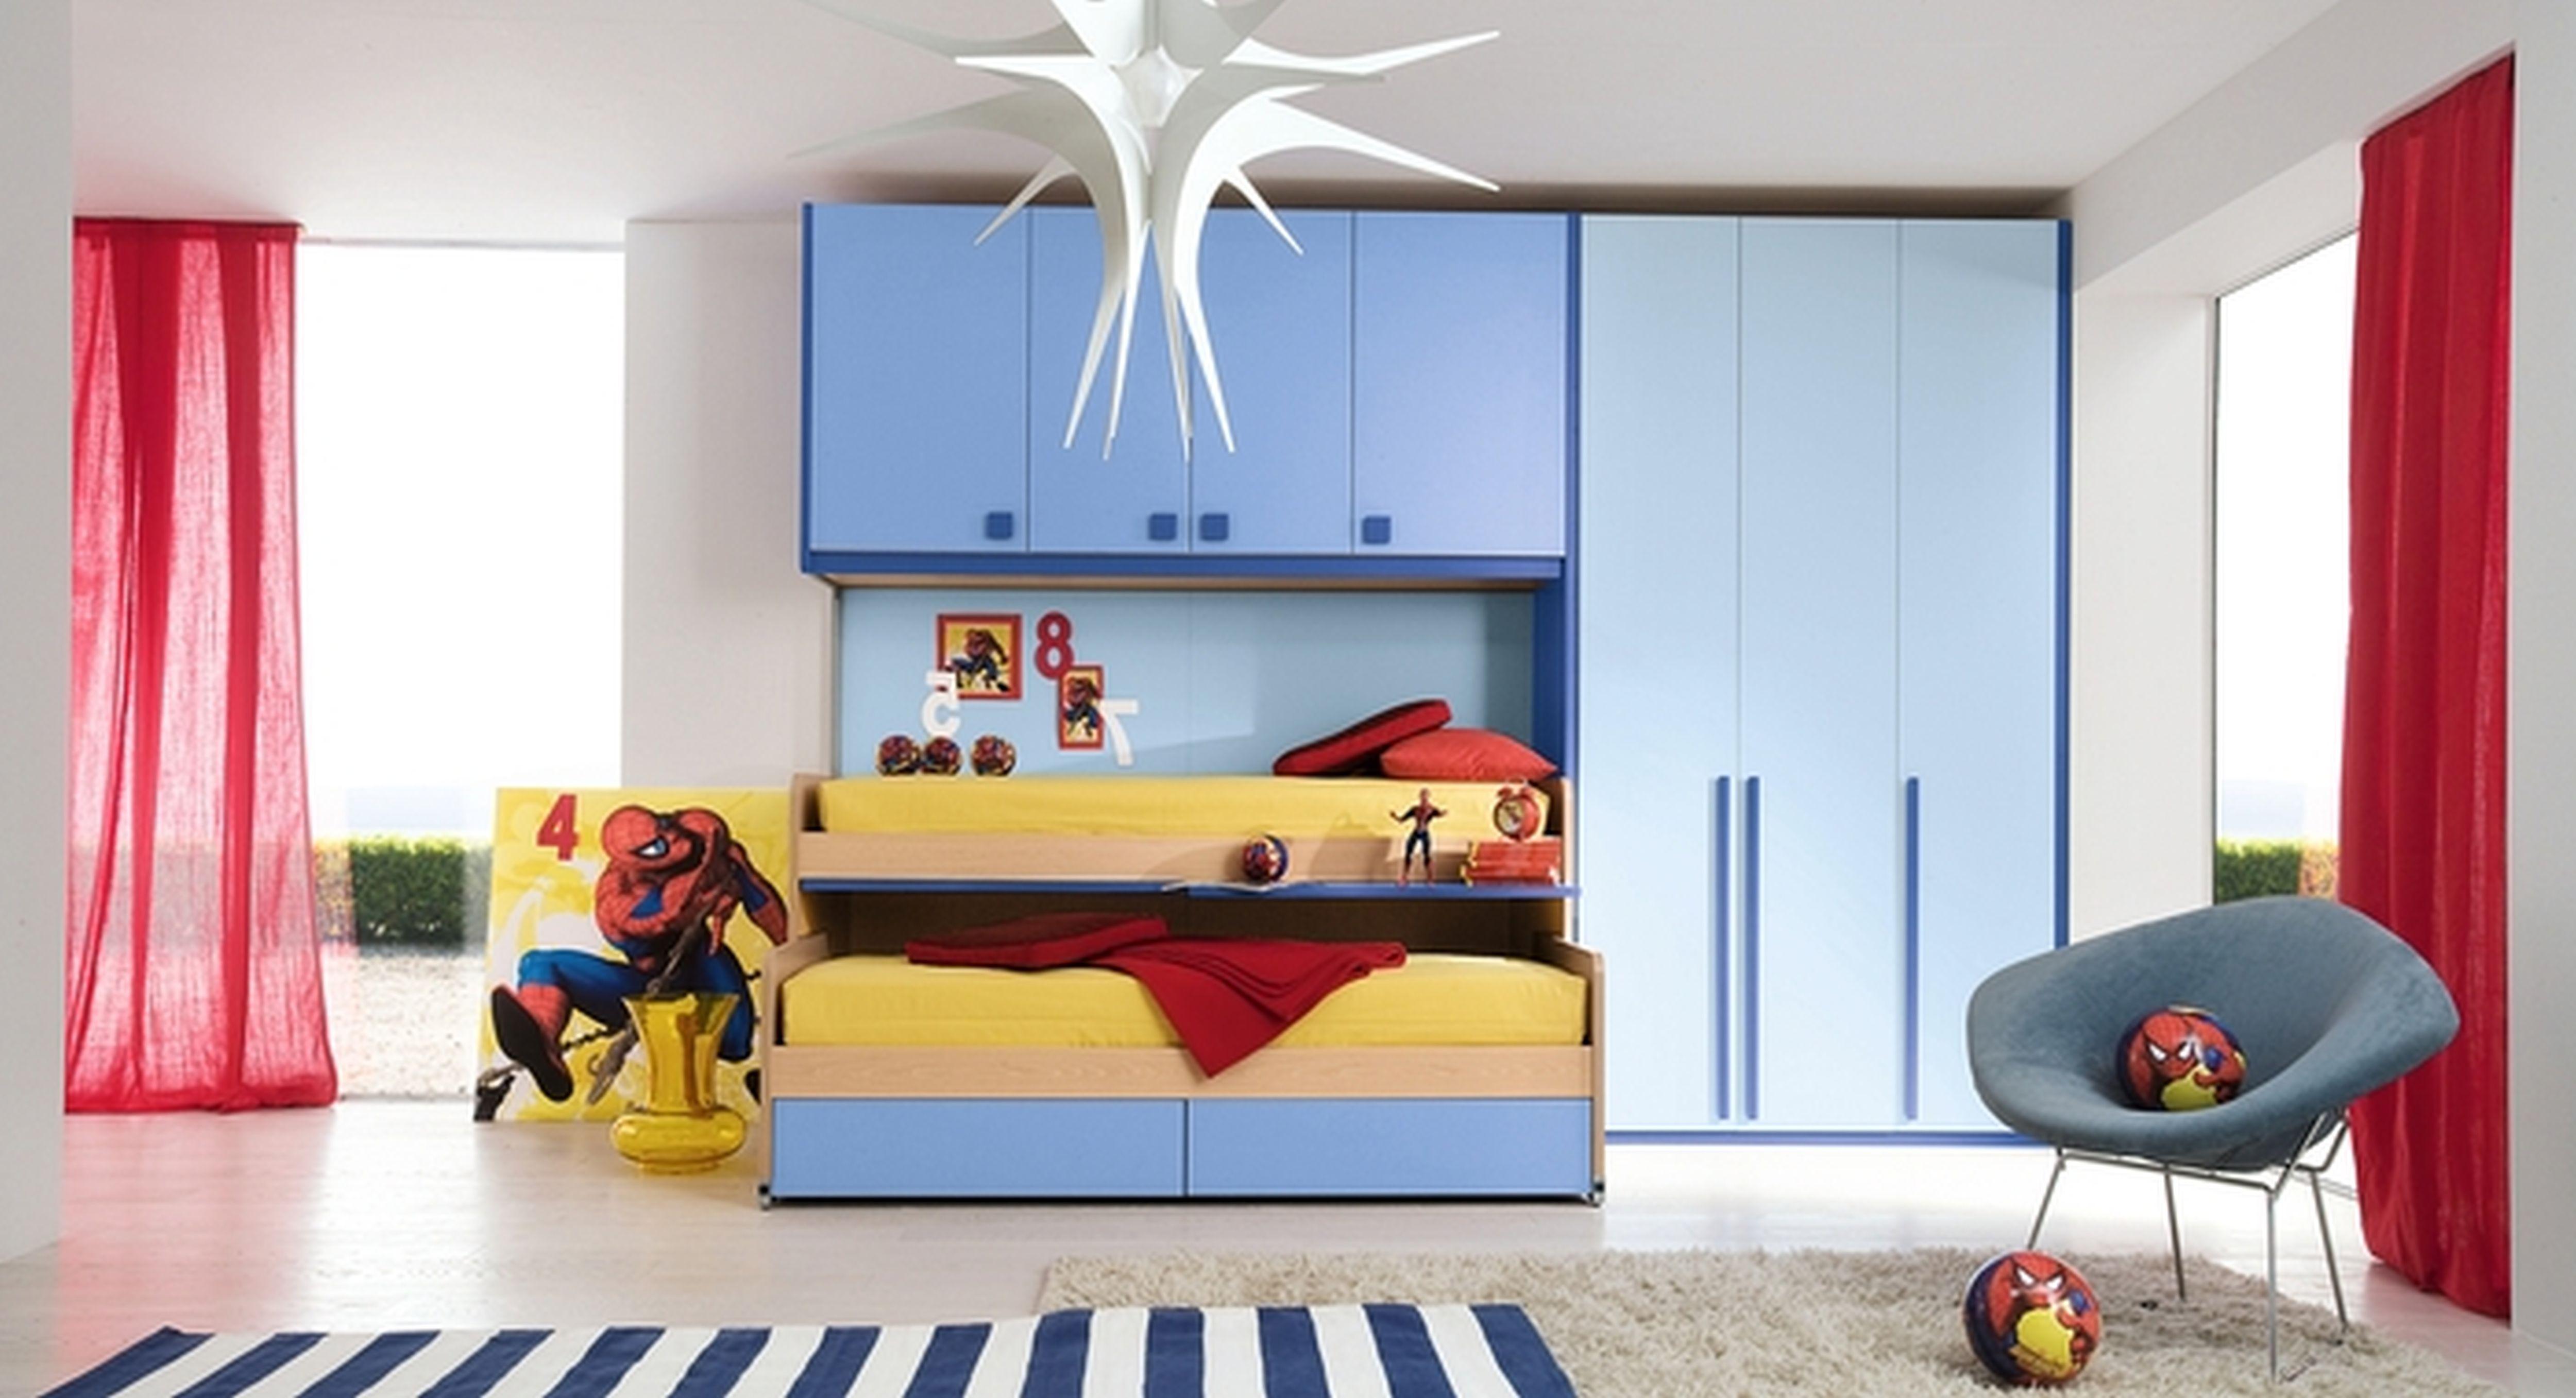 غرف نوم اولاد 2017 بالصور | المرسال